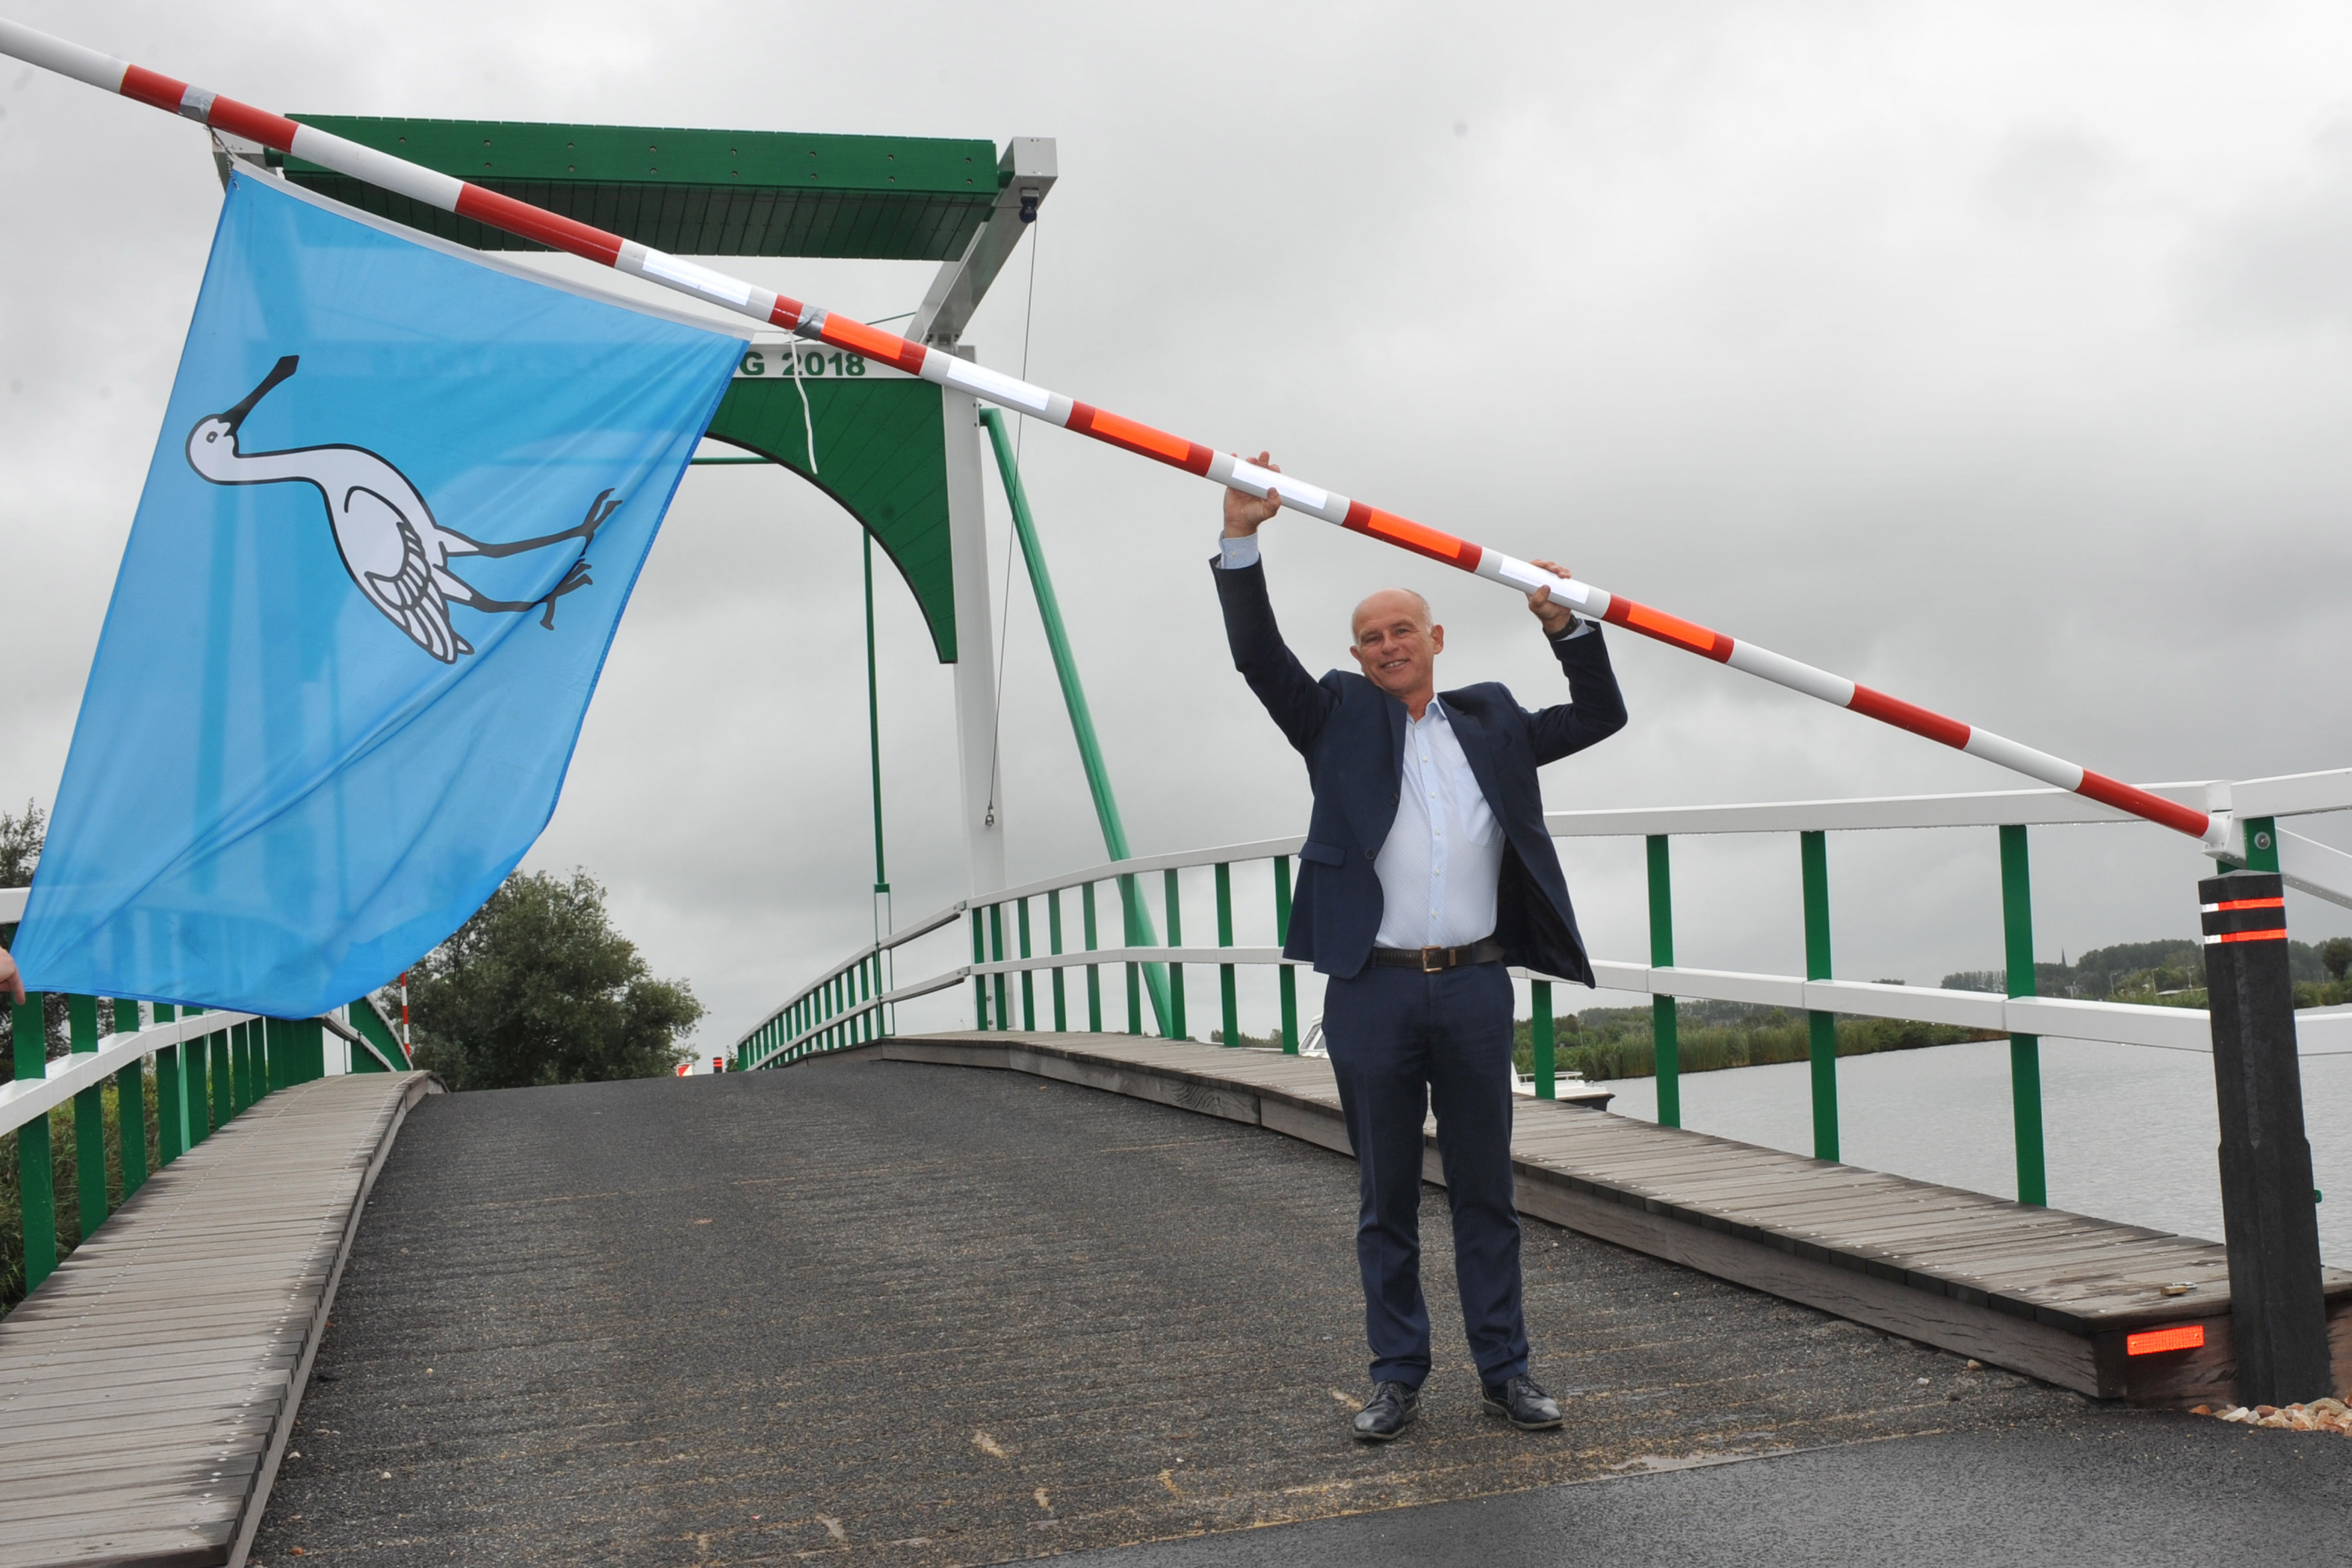 Wethouder Rob Berkhout opent Bartelsluisbrug. (Foto: Gemeente Wormerland)